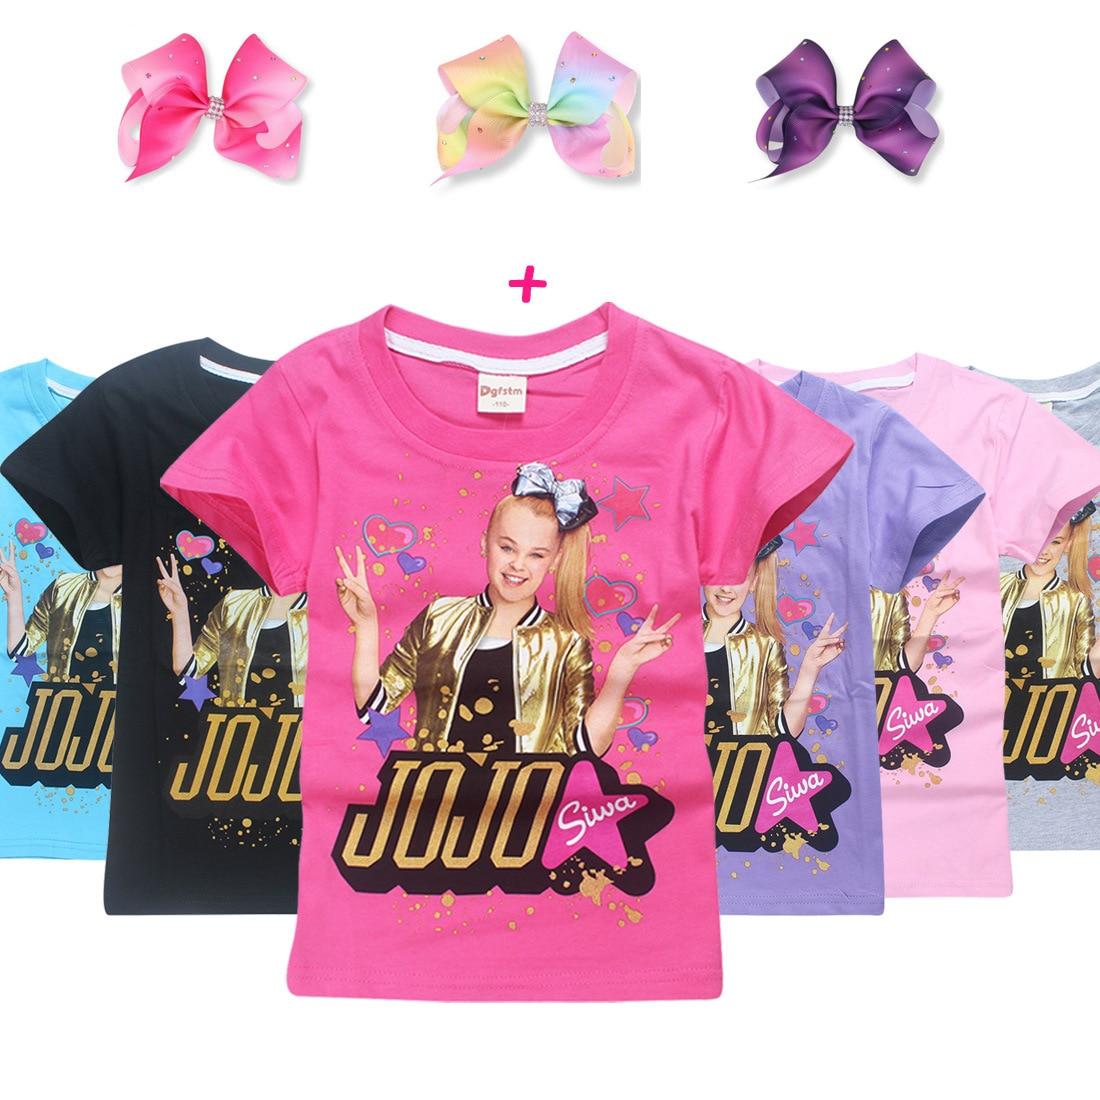 2018 New Children Summer t shirt girls boys Clothes jojo siwa Clothing Short Sleeve T-shirt Kids Cartoon Cotton Tshirt Tops Tees front ensemble shirt ideas